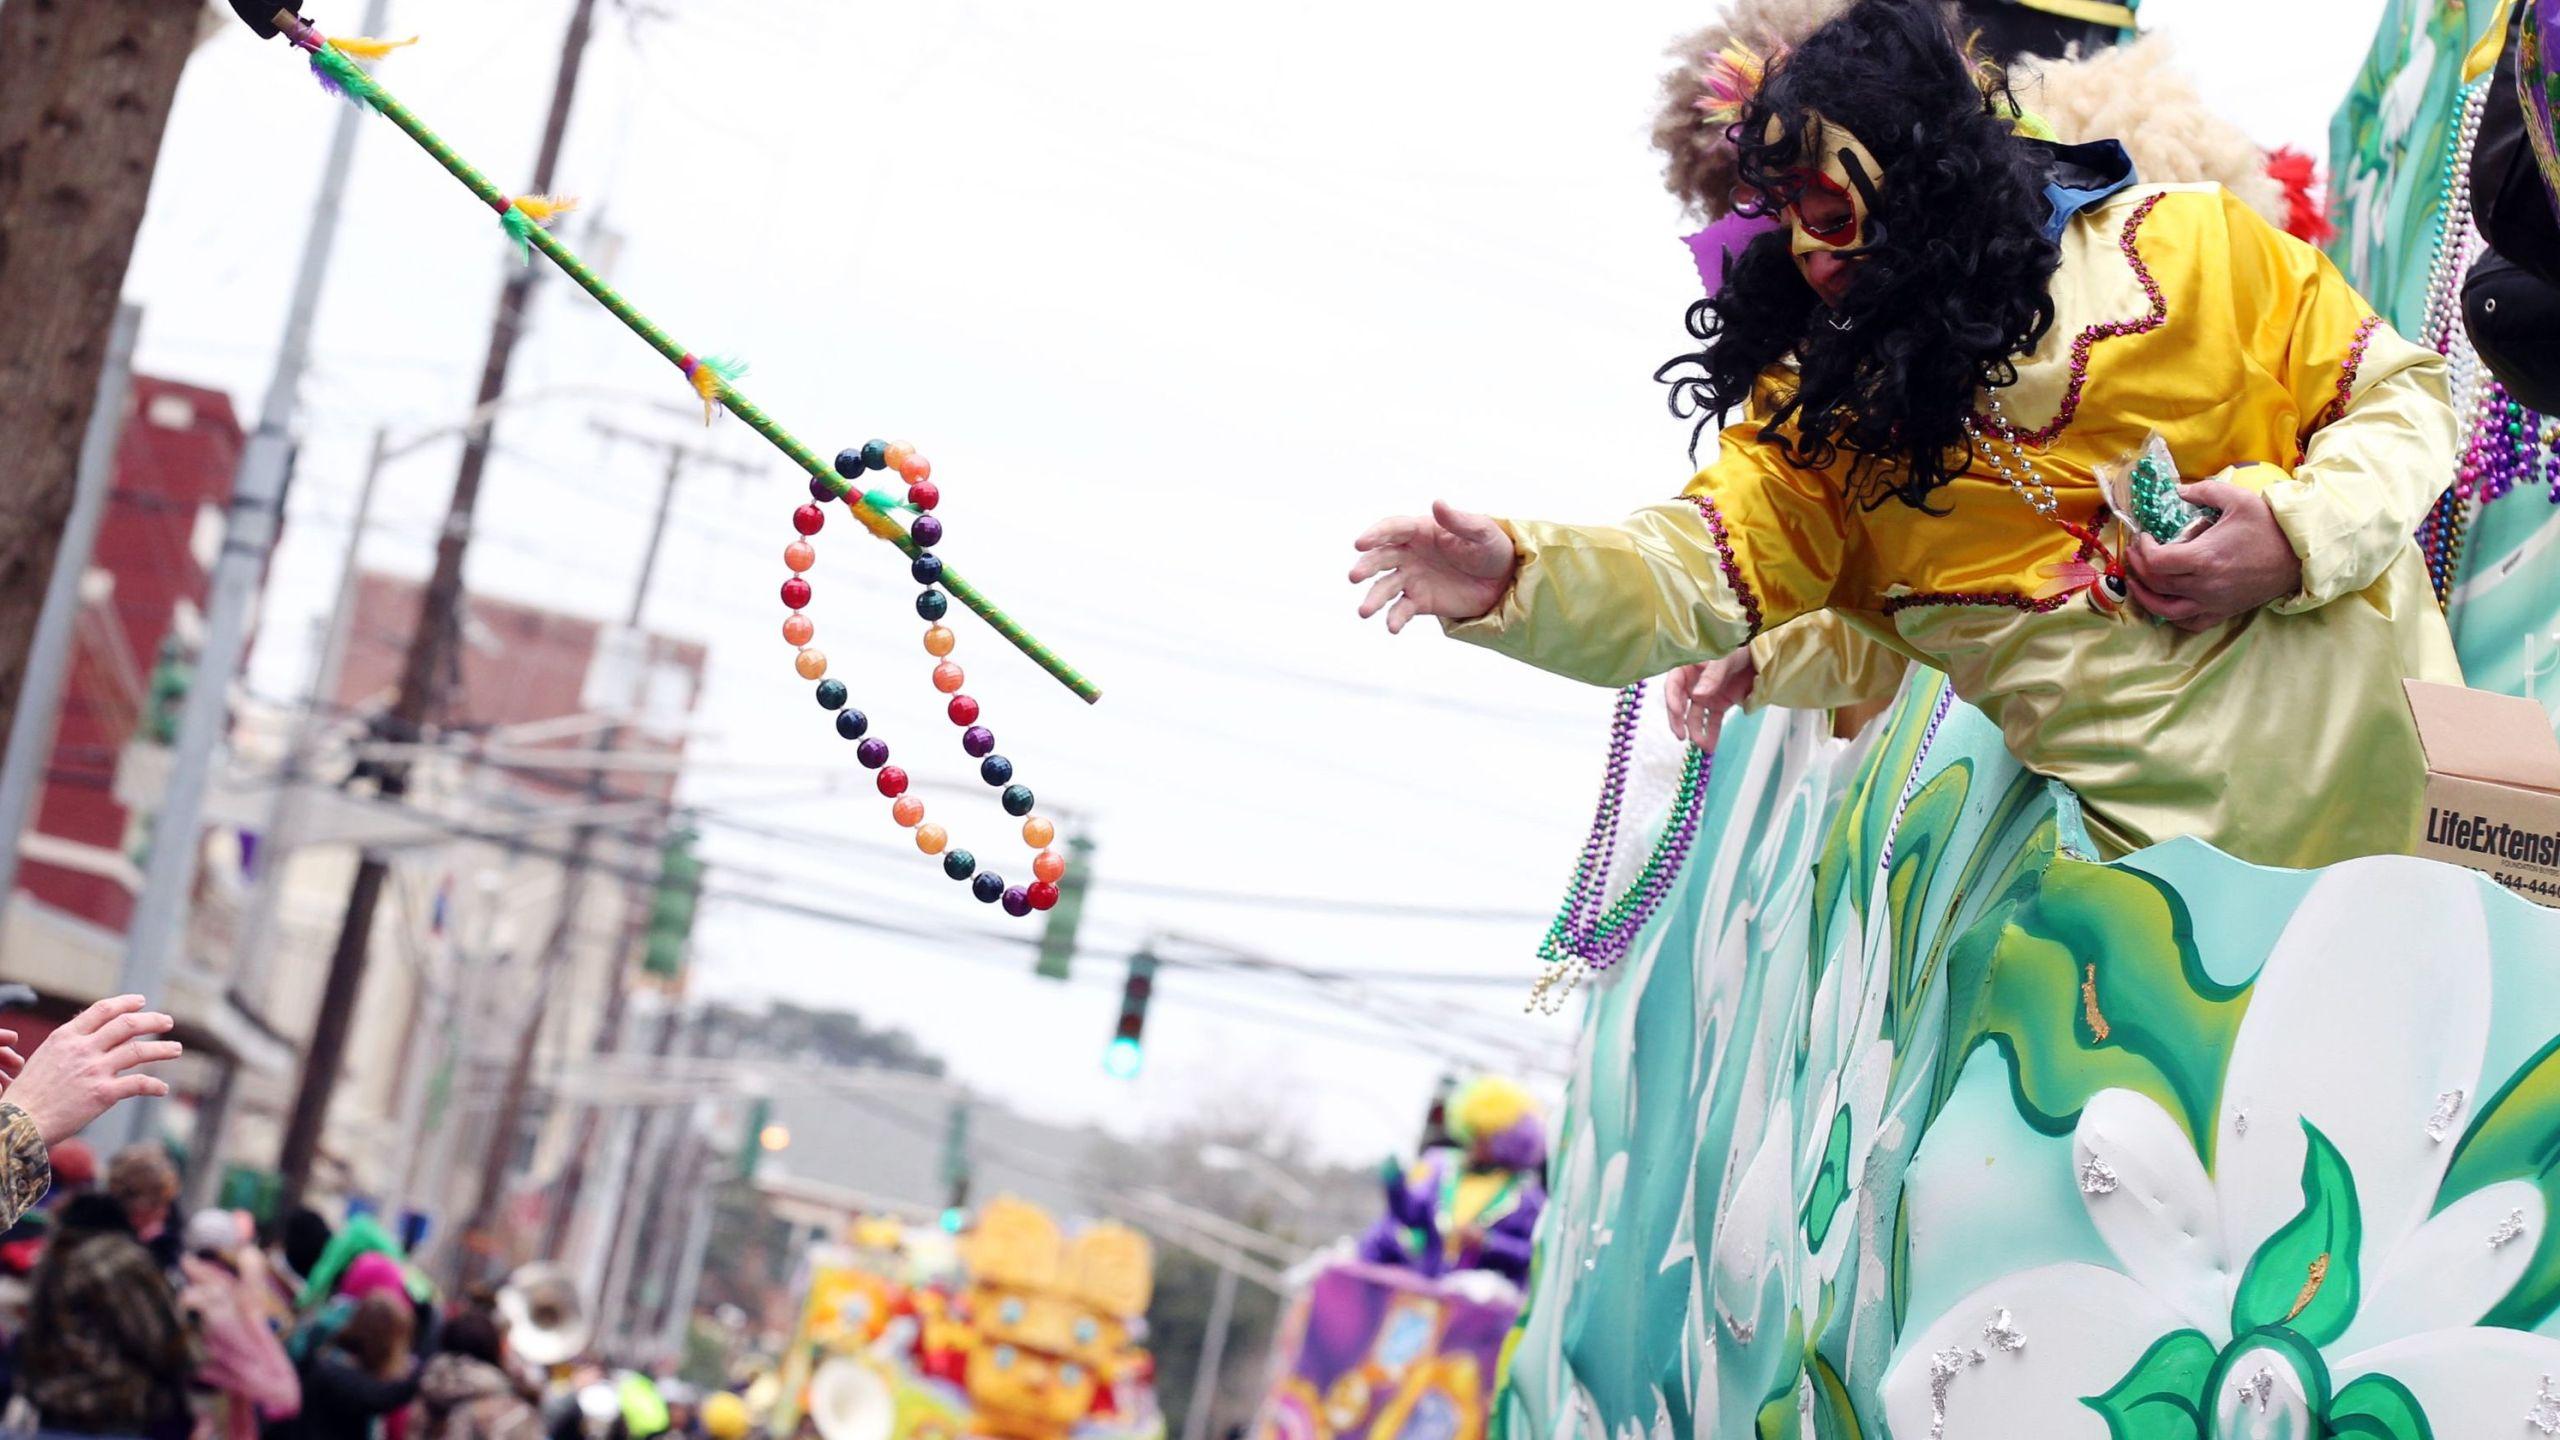 parade_1551804125985.jpg